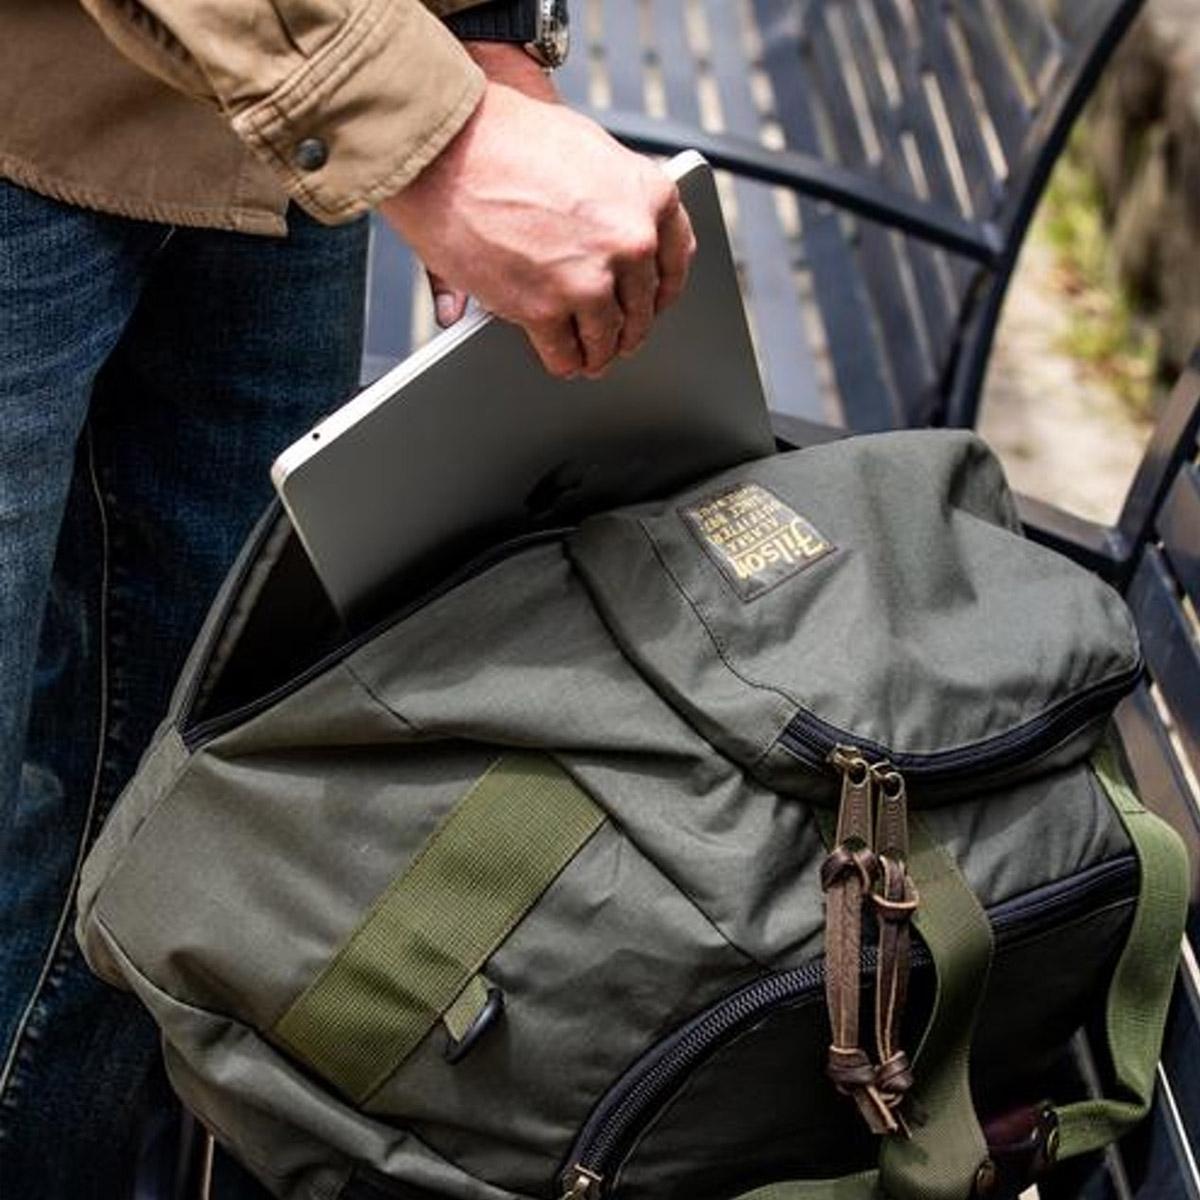 Filson Duffle Pack 20019935, versatile, strong and lightweight travel-companion